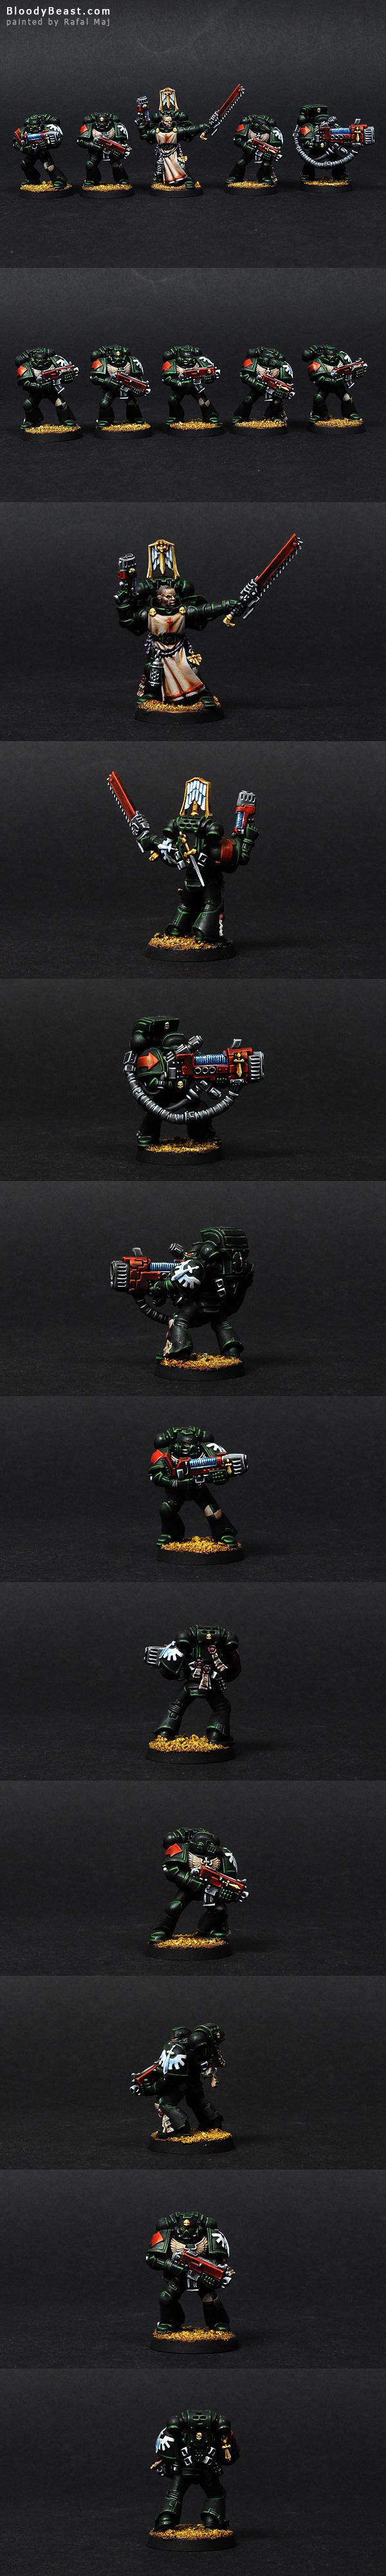 Dark Angels Tactical Squad painted by Rafal Maj (BloodyBeast.com)